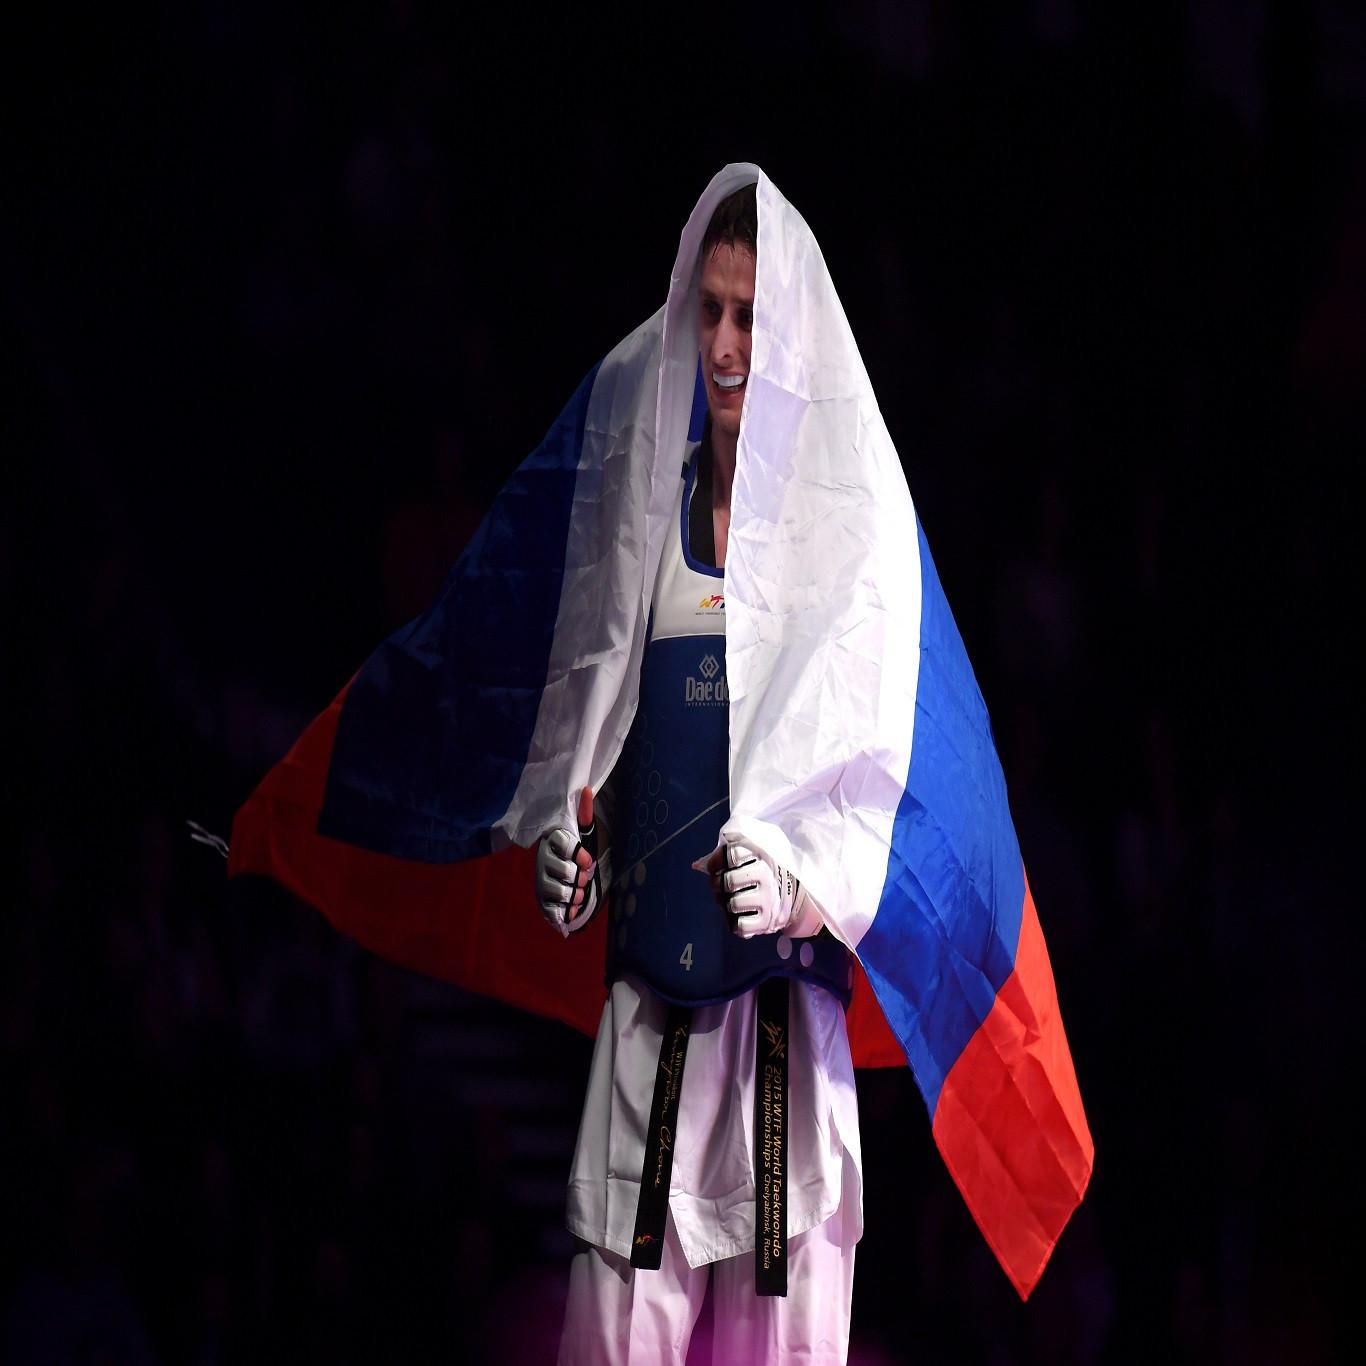 Vladislav Larin - on the verge of Russian history